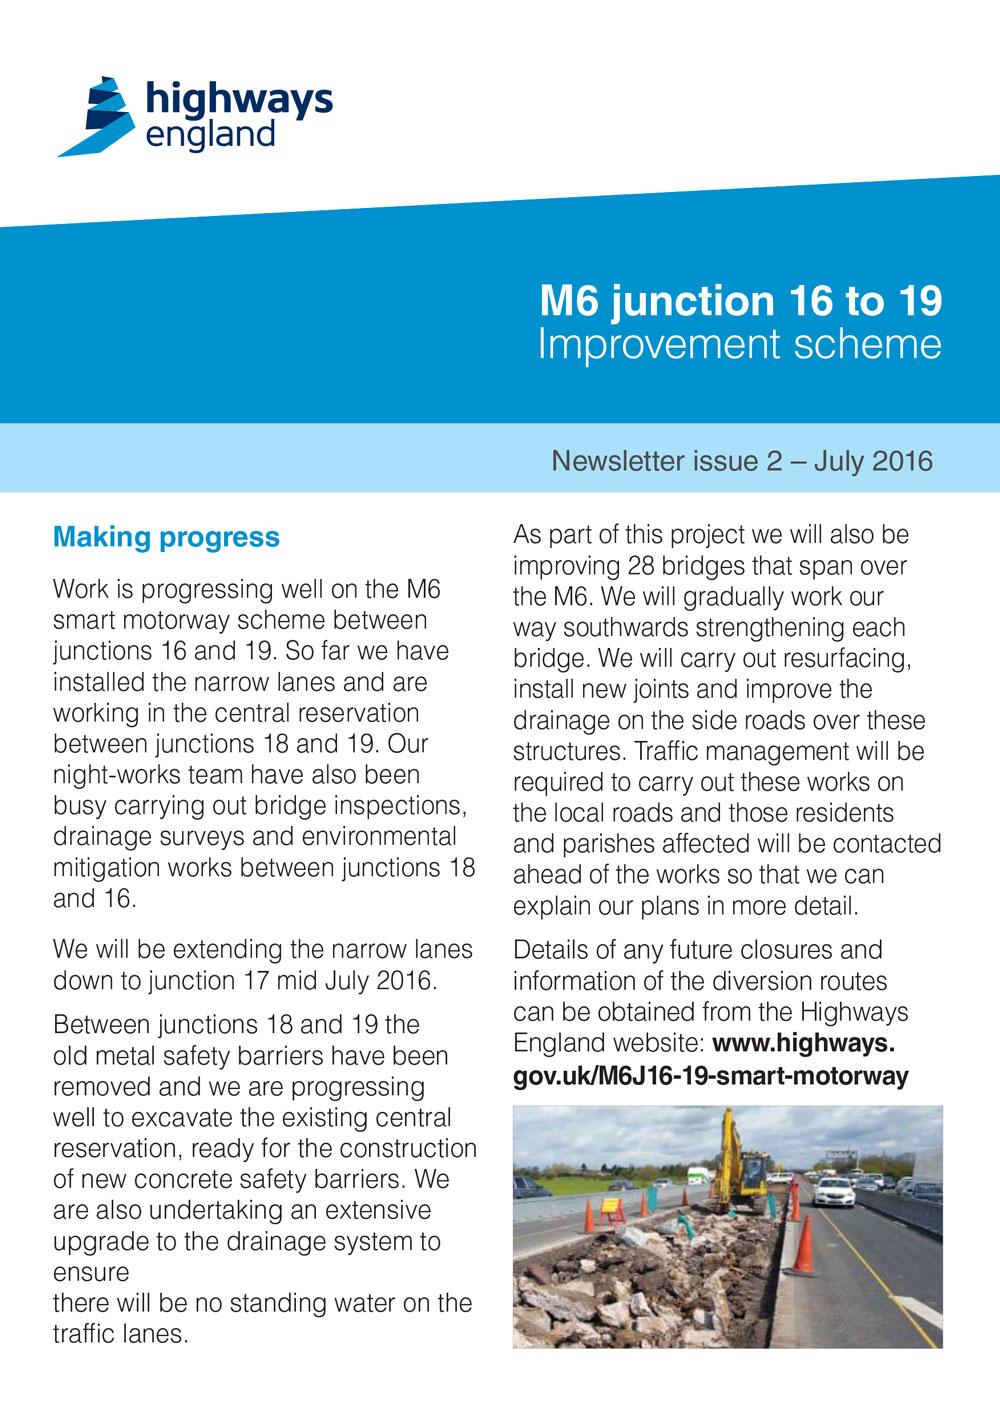 M6 Junction 16-19 Smart Motorway July Newsletter